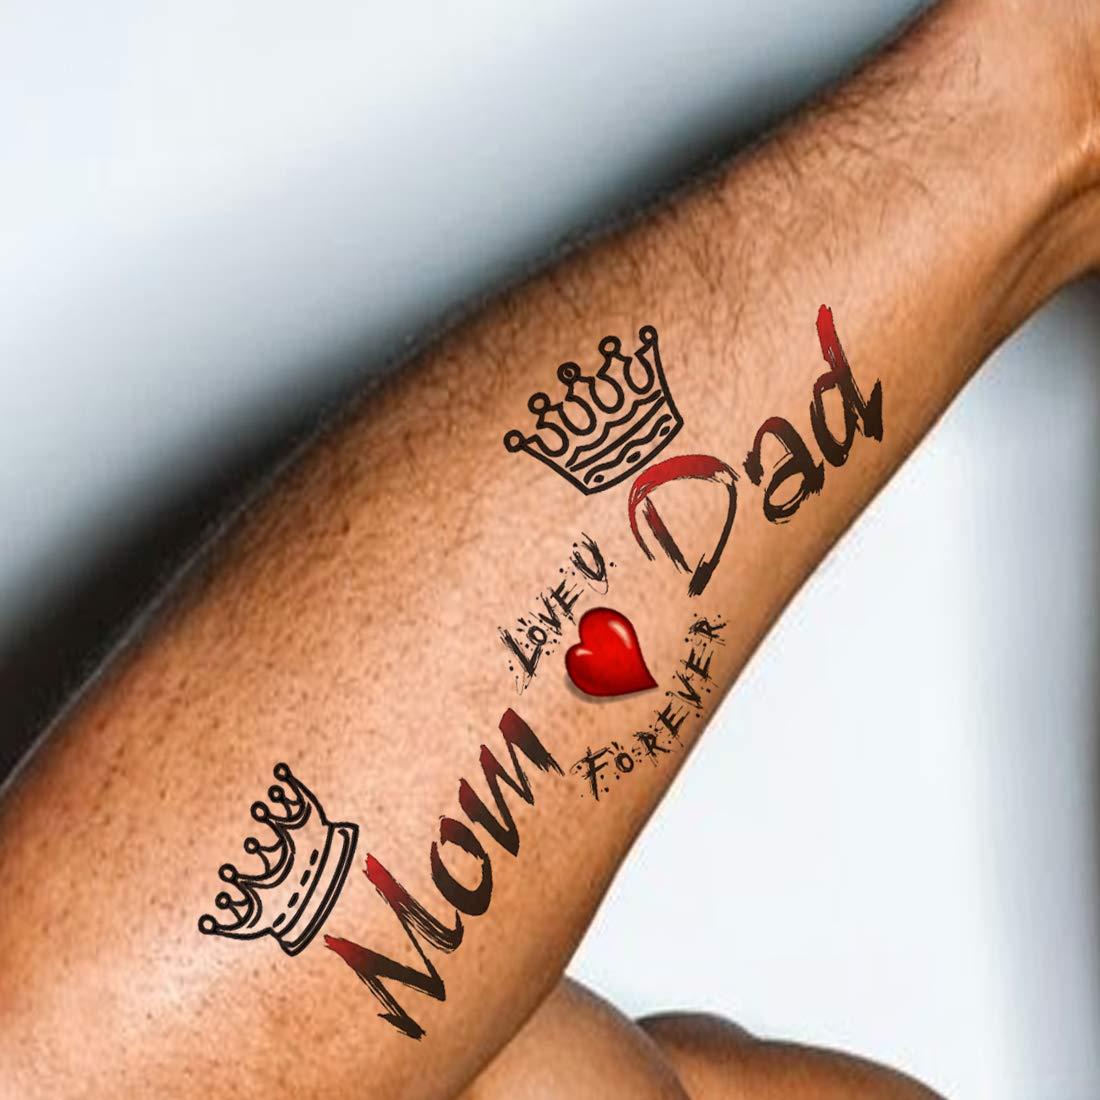 Voorkoms Mom Dad Tattoo Waterproof Men and Women Temporary Body ...